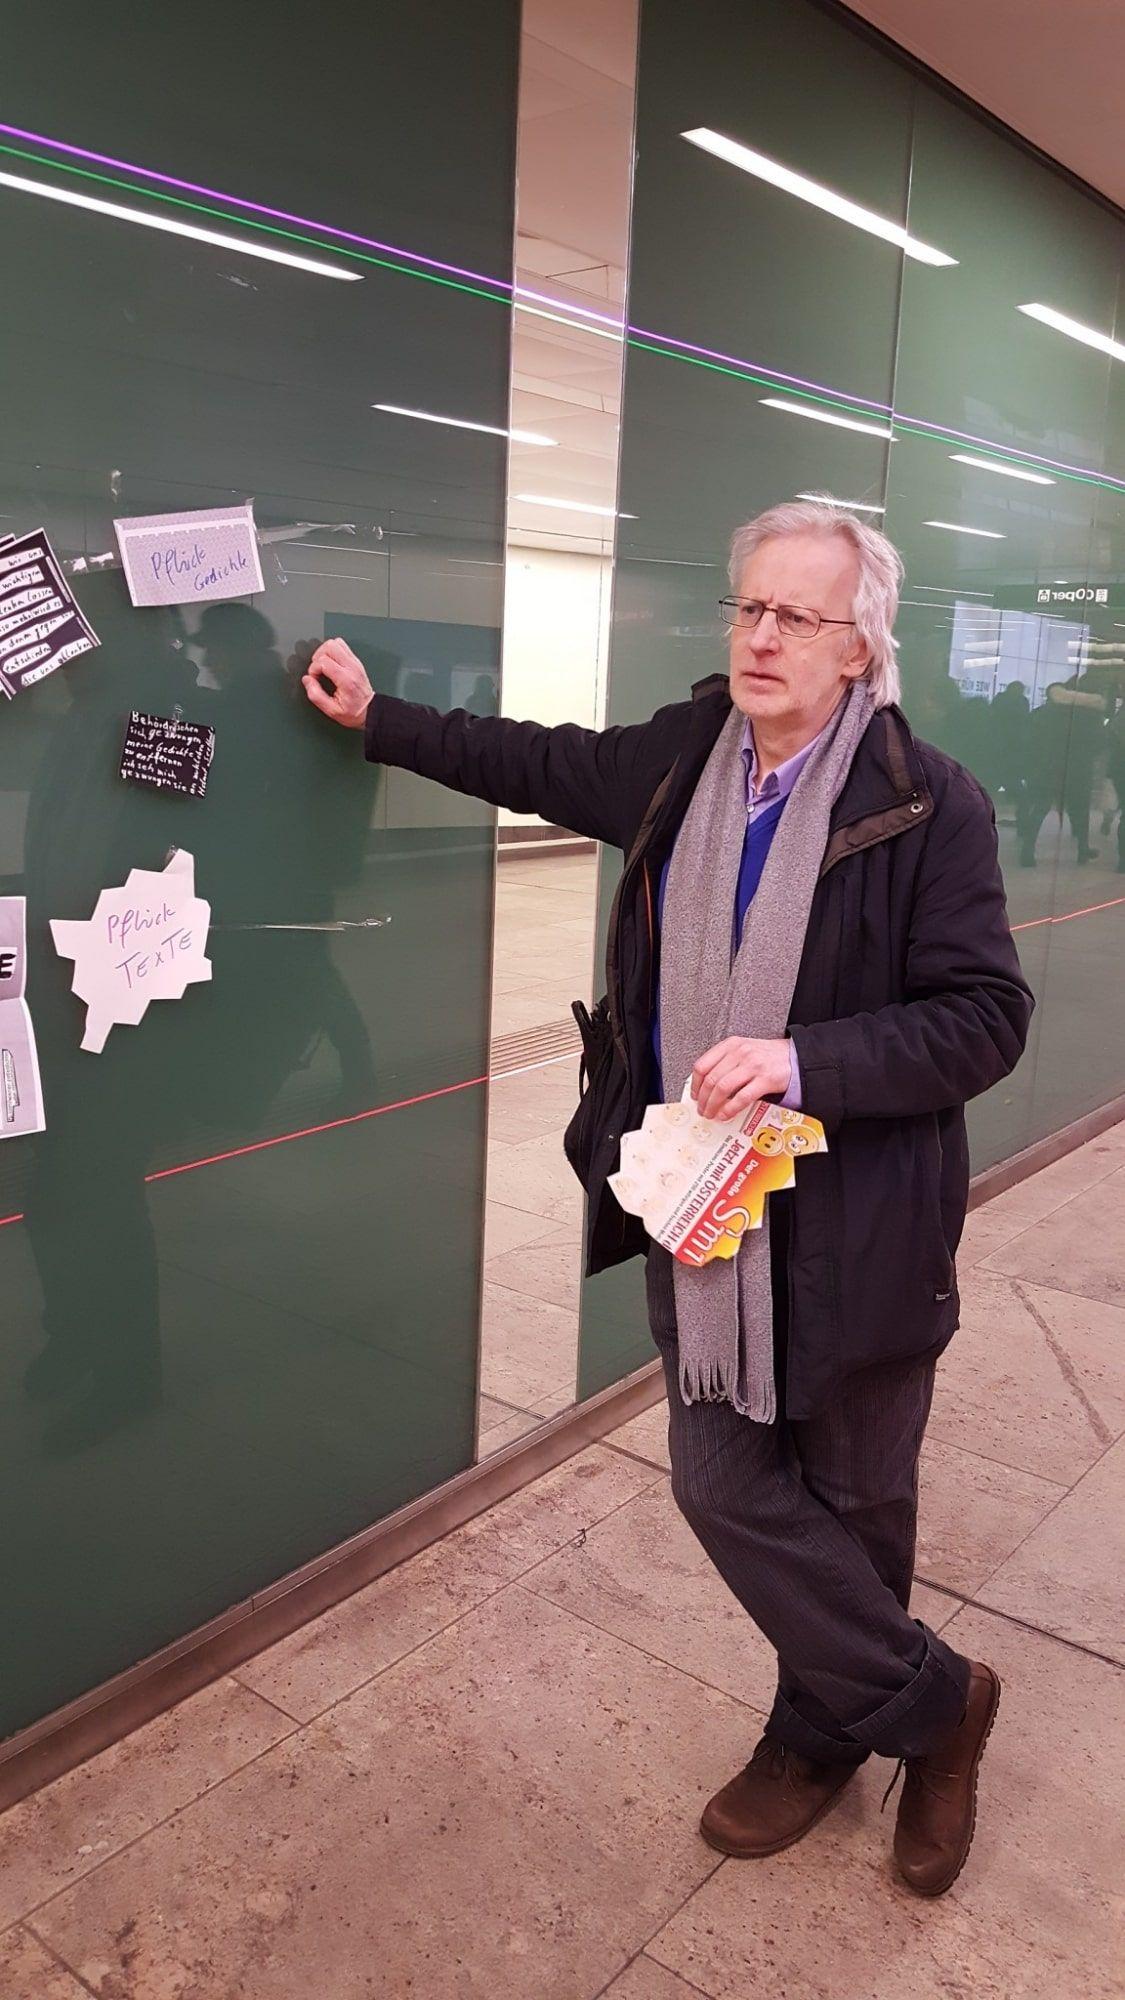 Zettelpoet: Helmut Seethaler